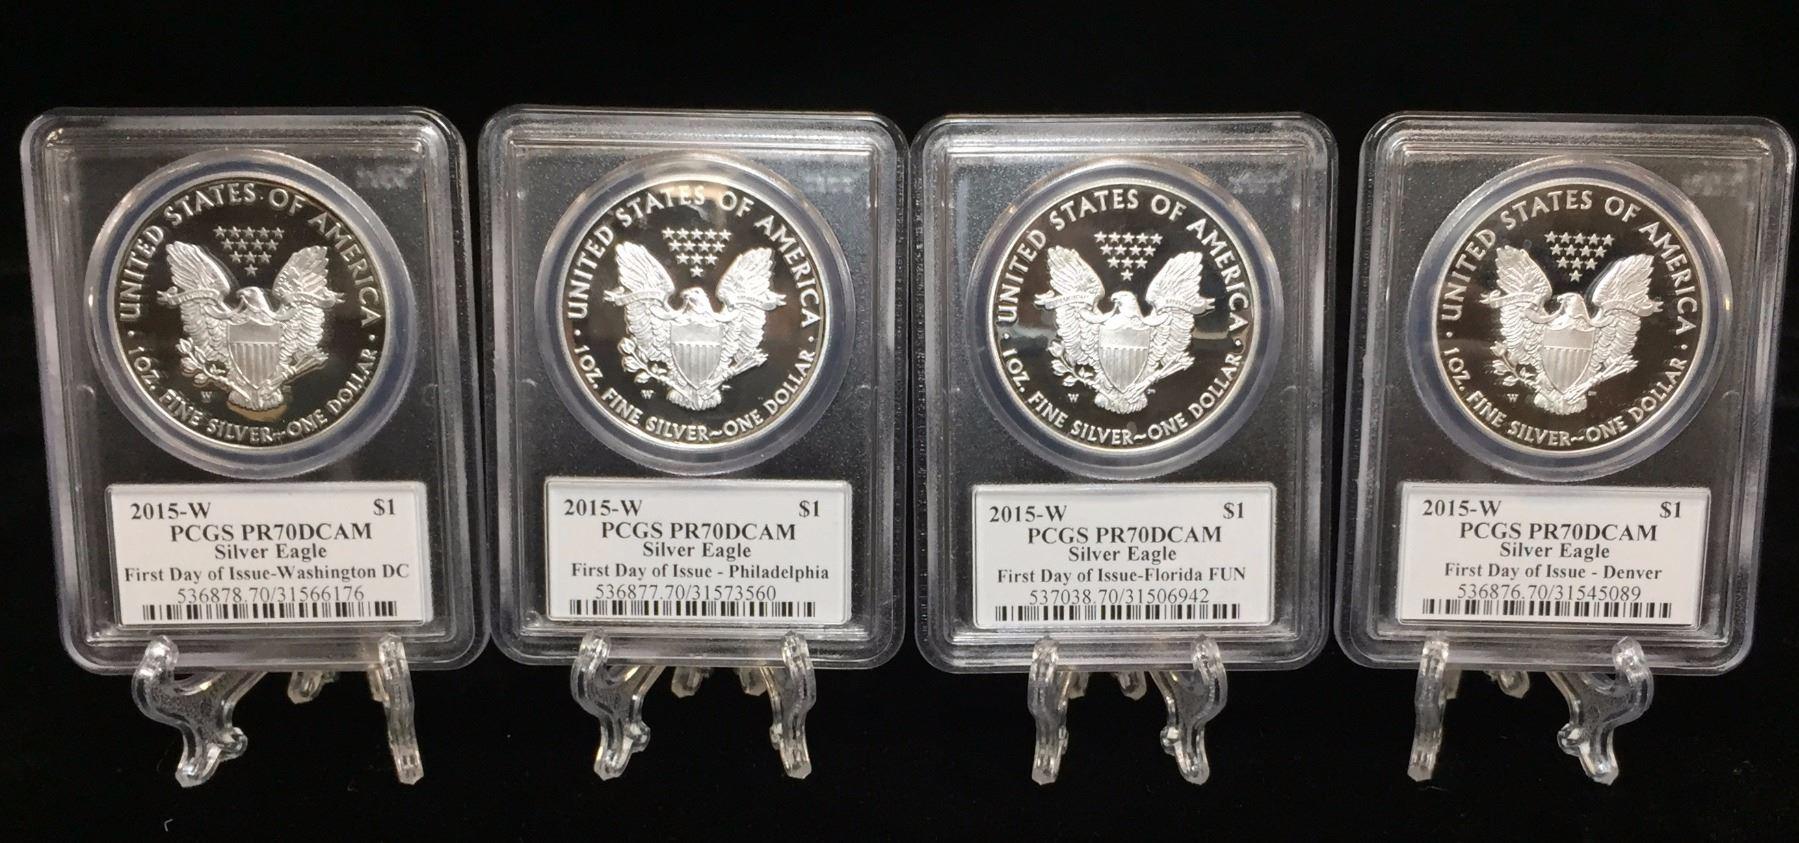 2015 W 1 American Silver Eagle West Point Mint Pcgs Pr 70